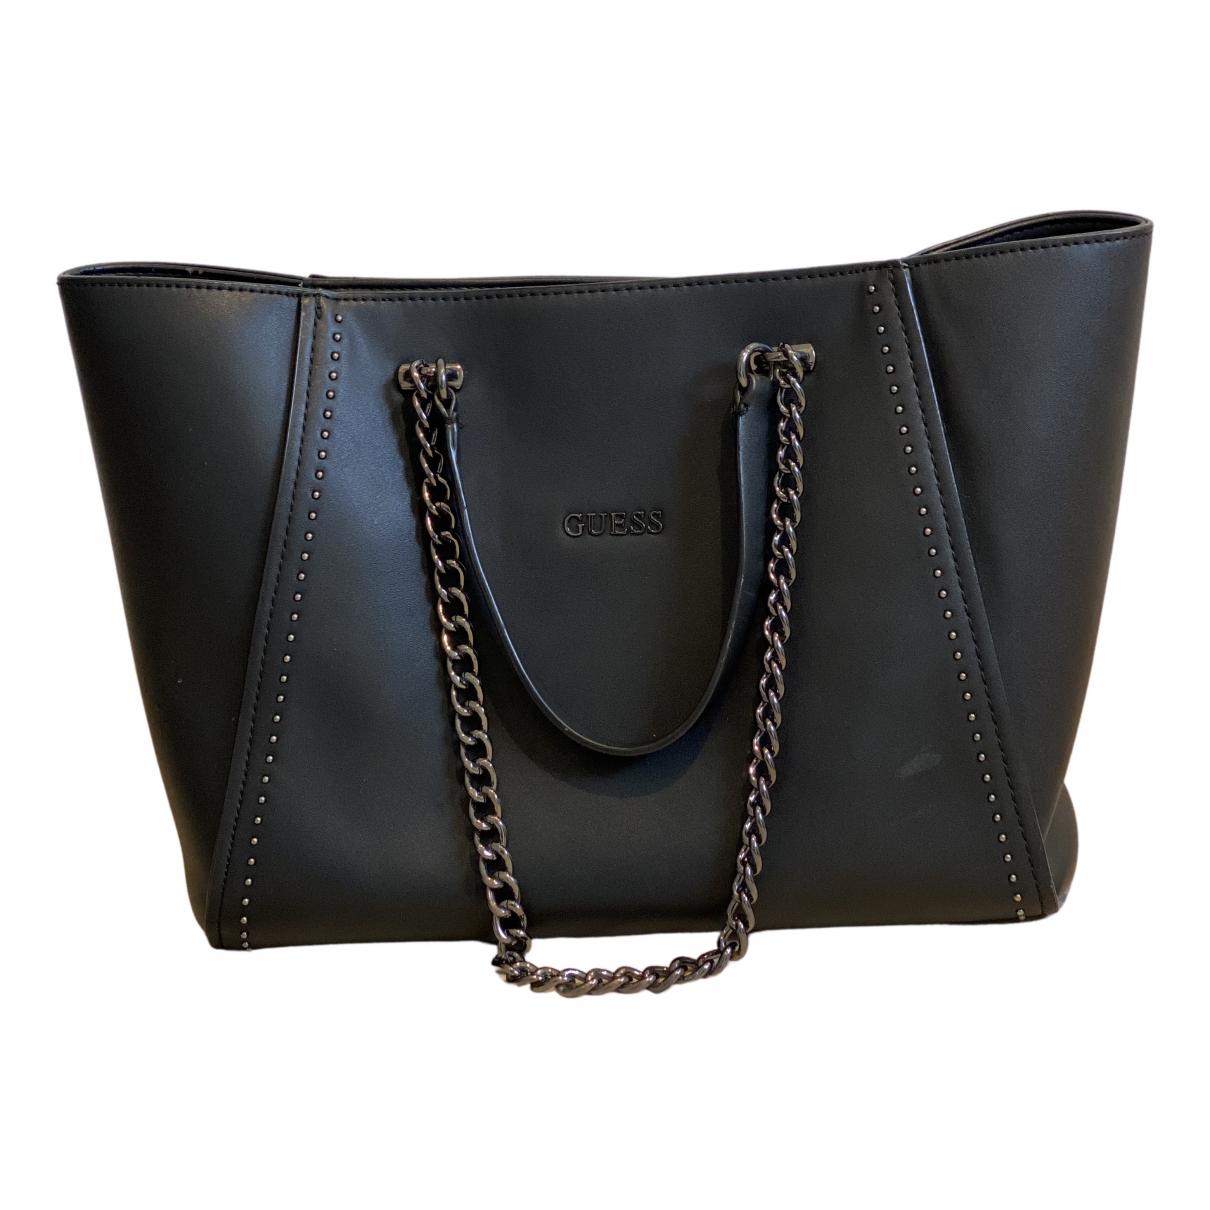 Guess \N Handtasche in  Schwarz Synthetik